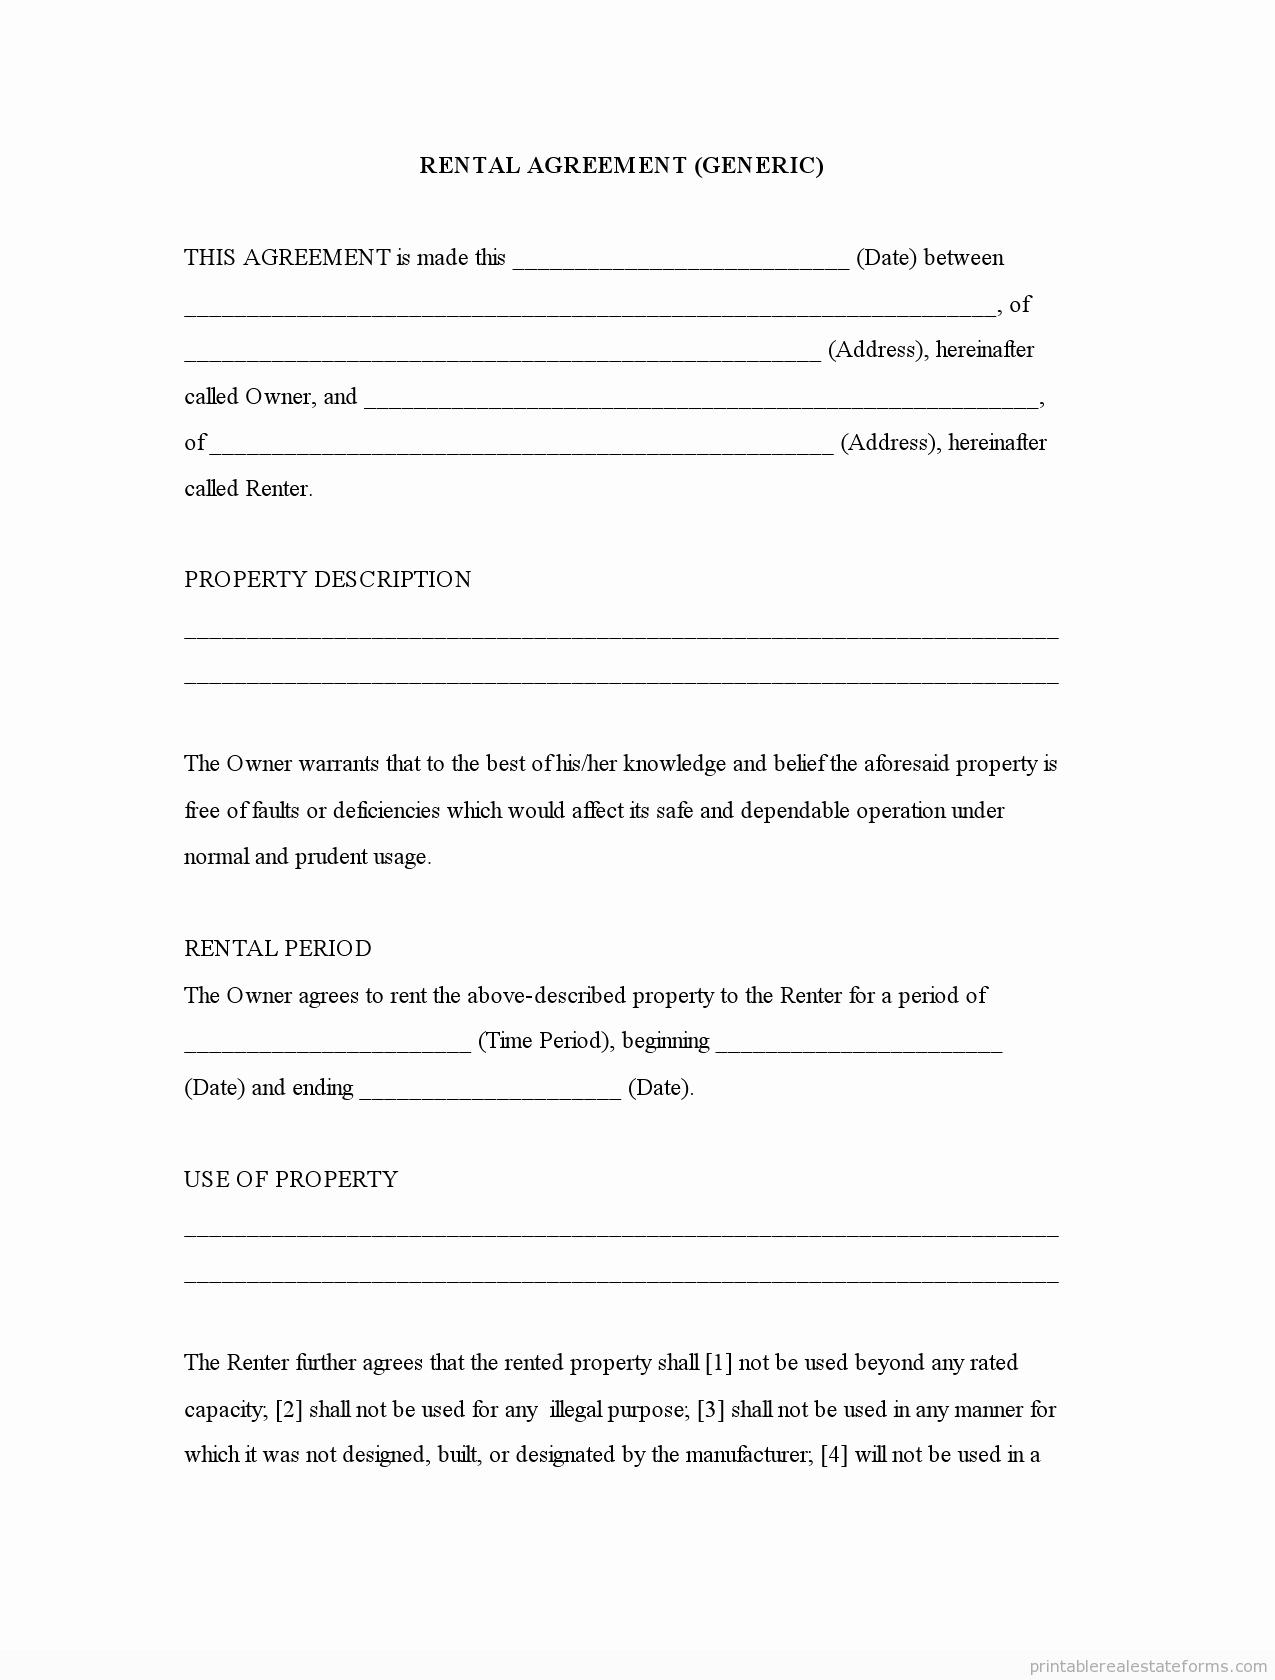 Free Printable Rental Agreement Luxury Generic Template Rental Agreement forms Free Printable